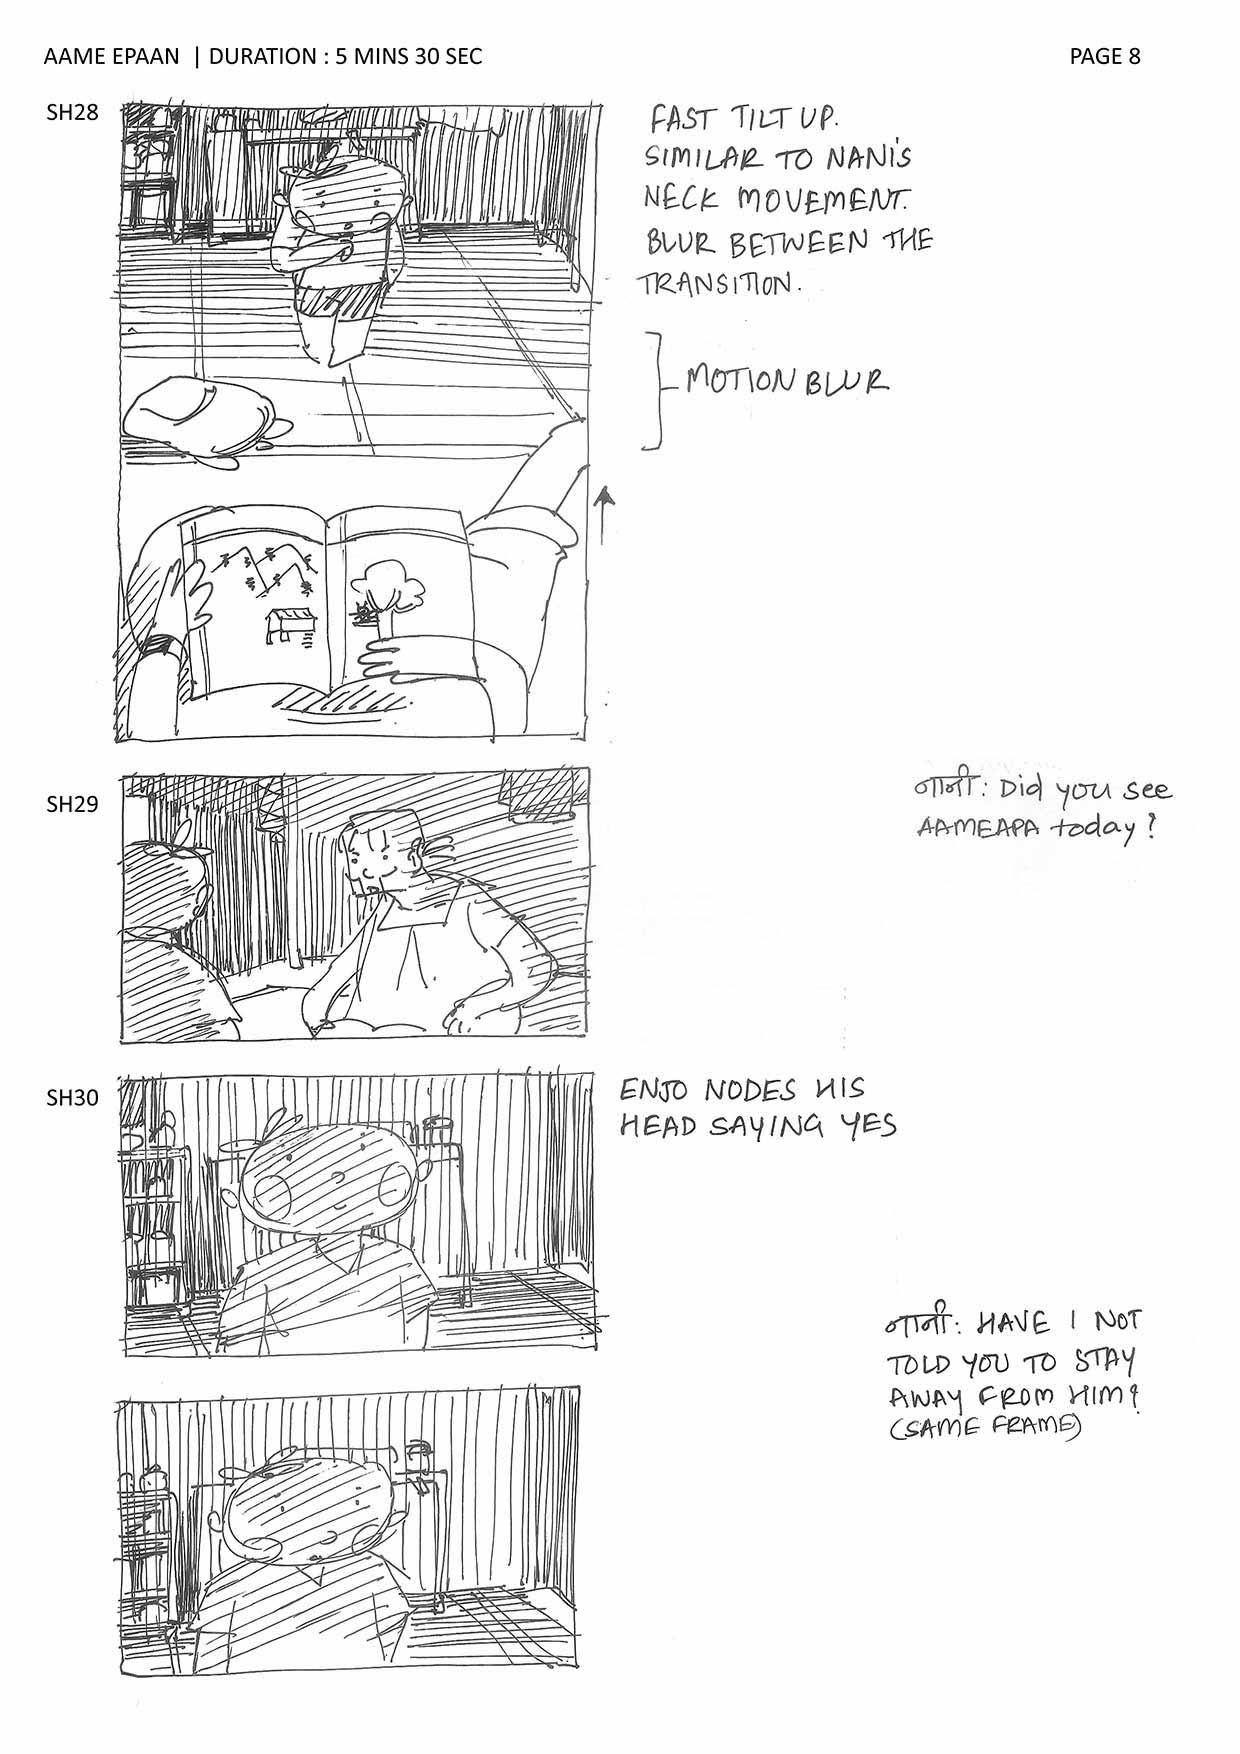 amepa storyboard 2